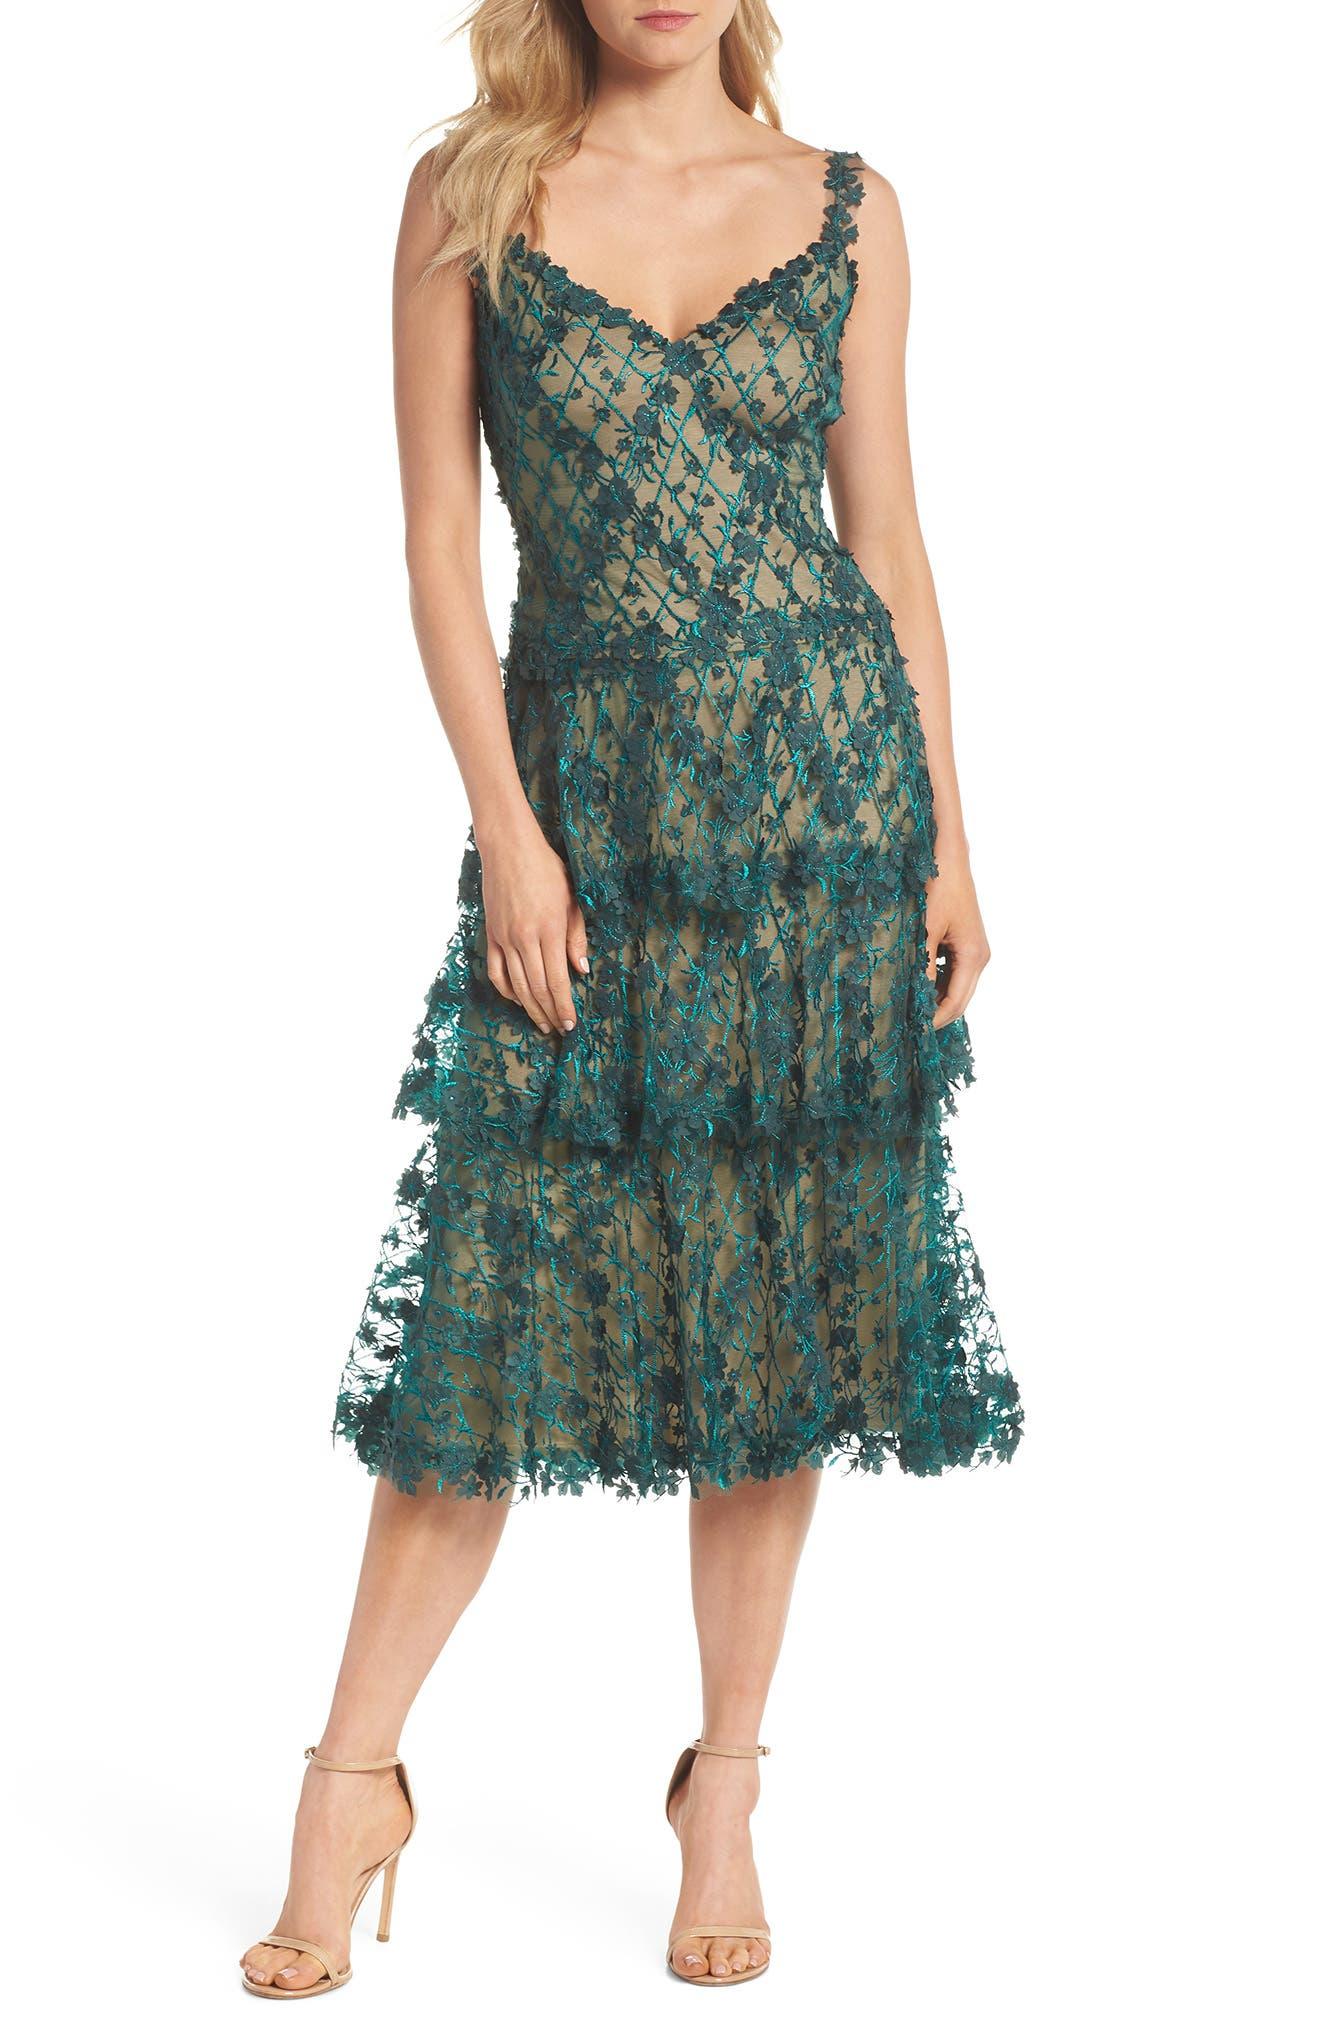 3D Floral Midi Dress,                         Main,                         color, PINE/ NUDE